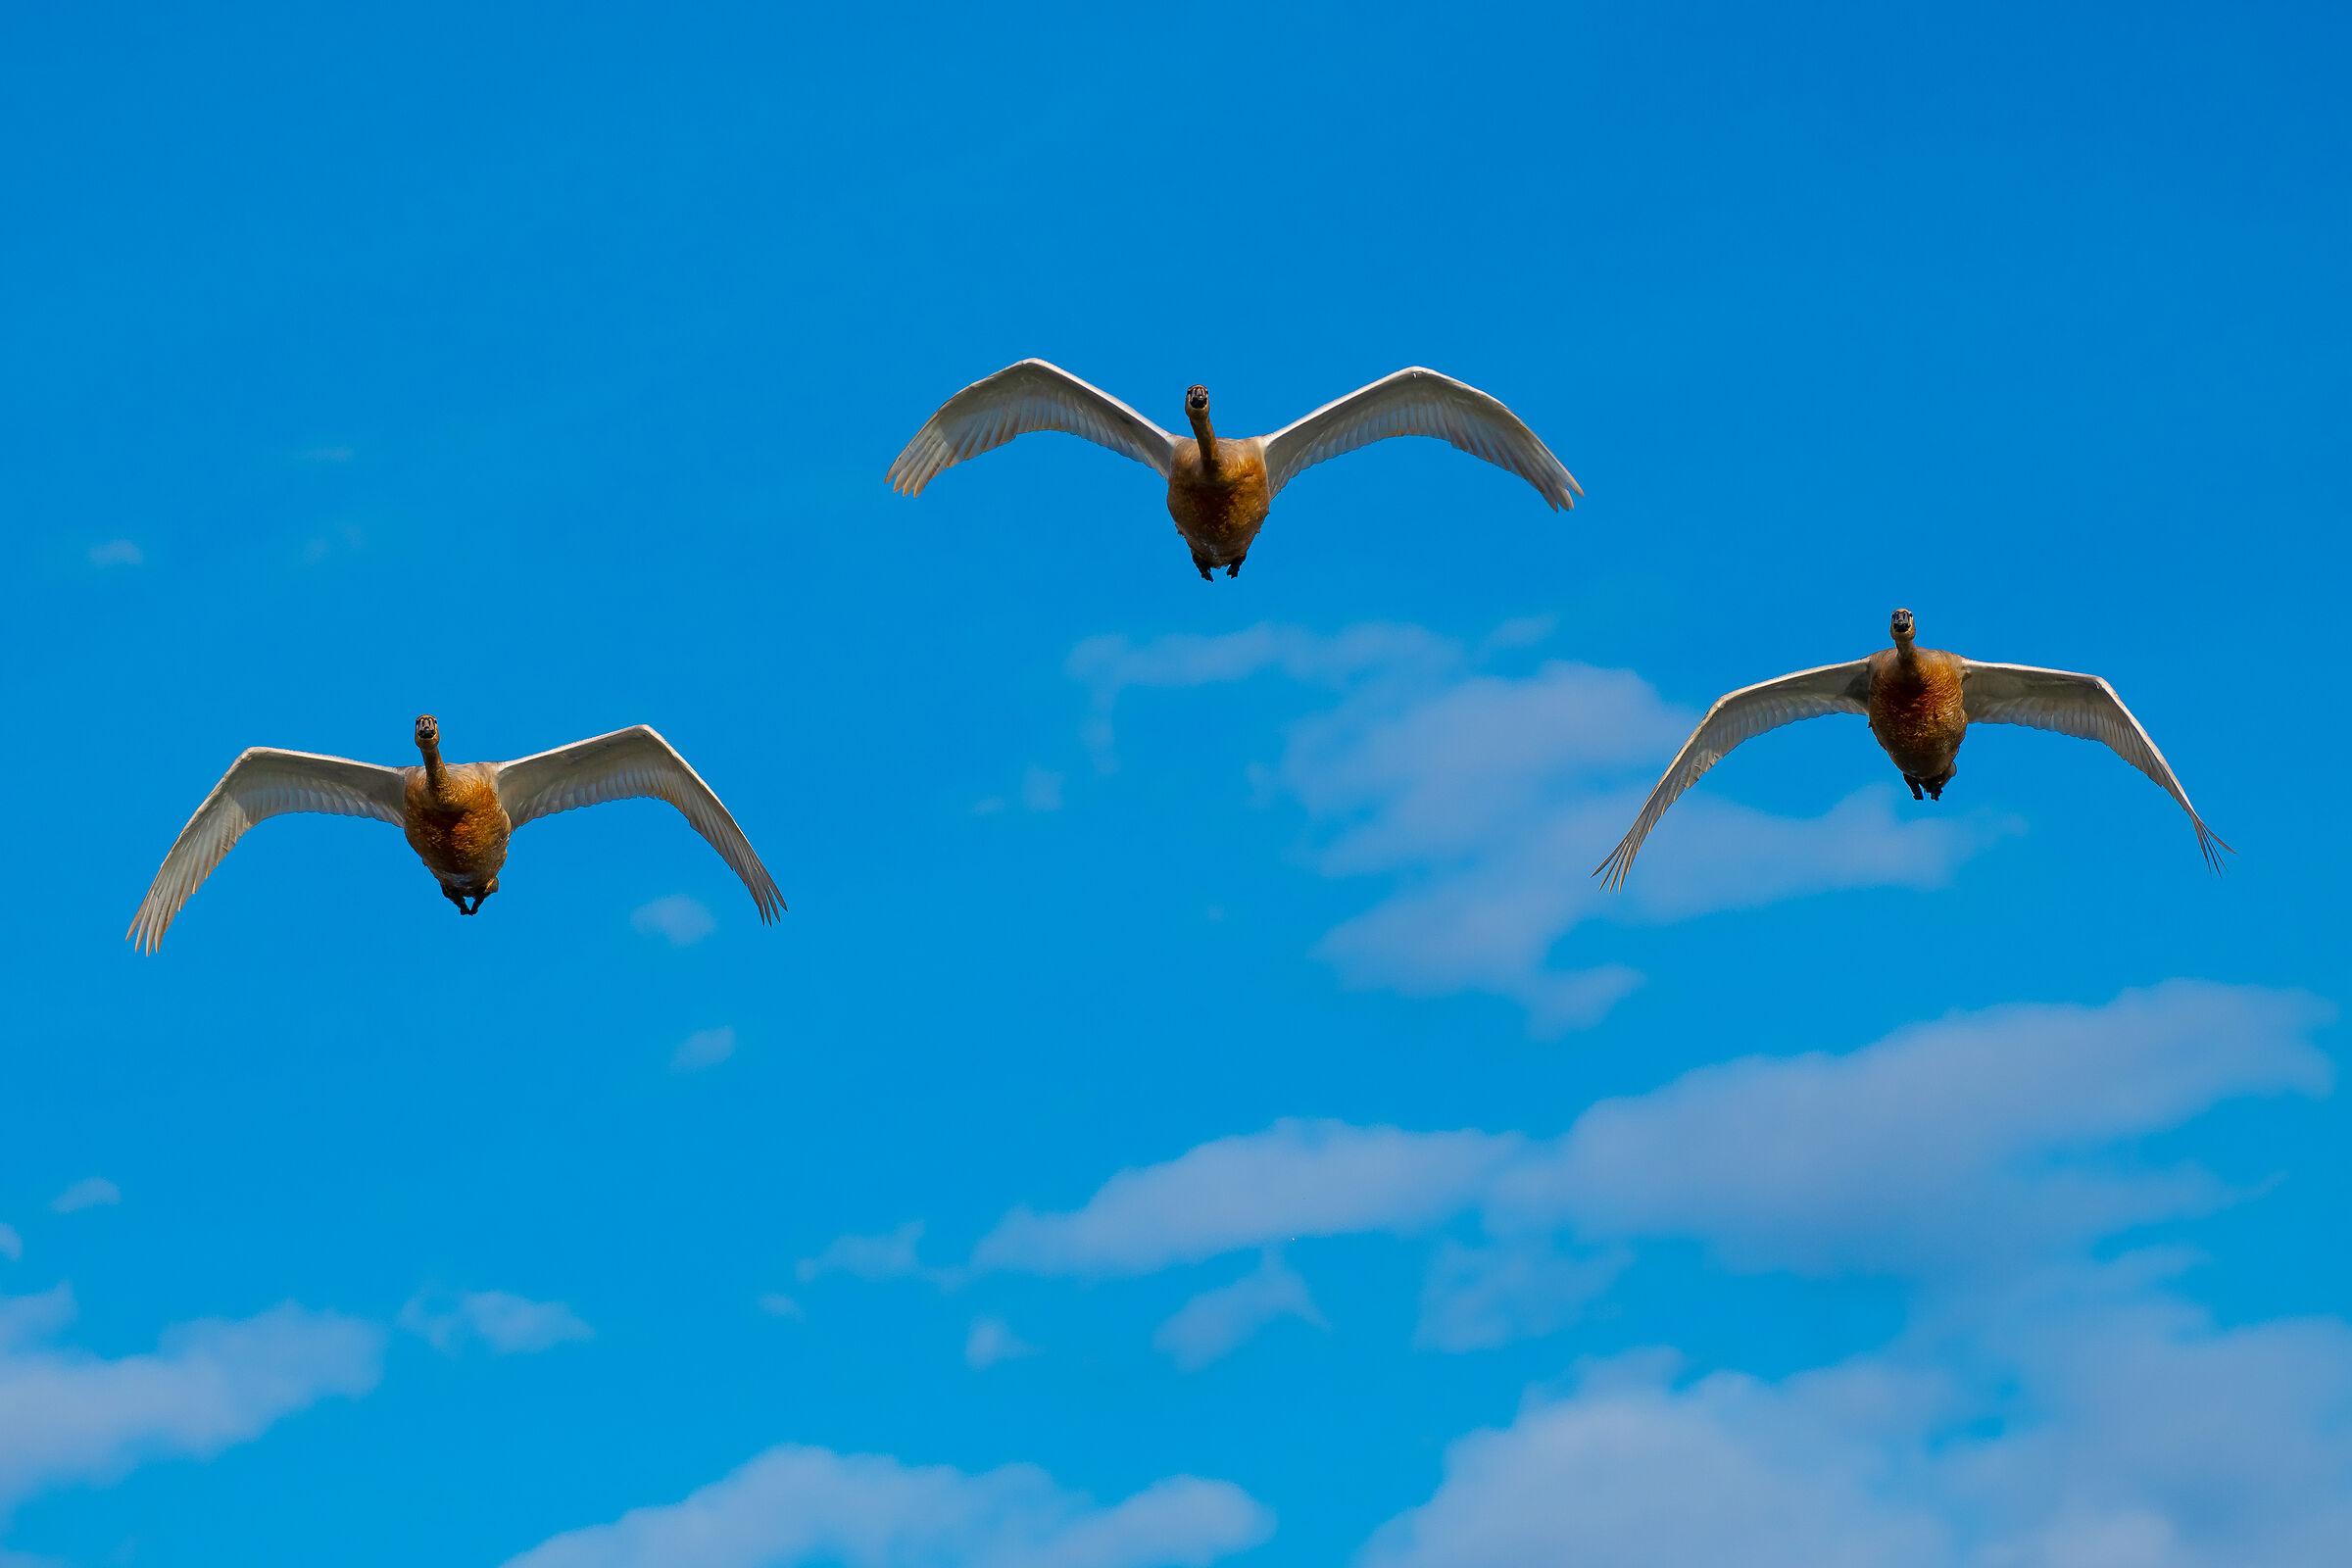 The Swan flight...